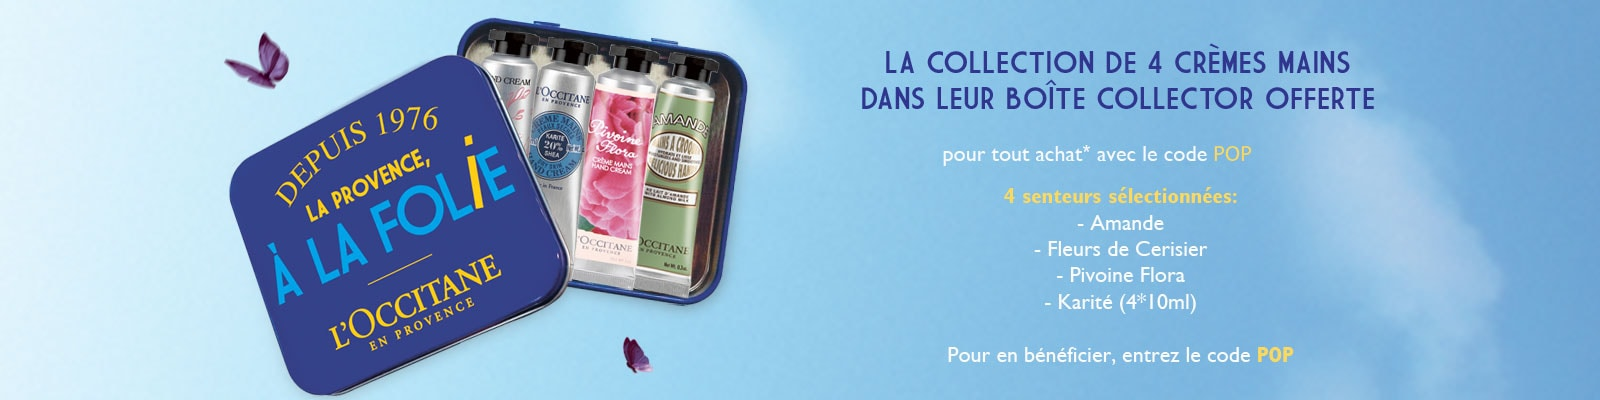 Offre Boîte Collector - L'Occitane en Provence